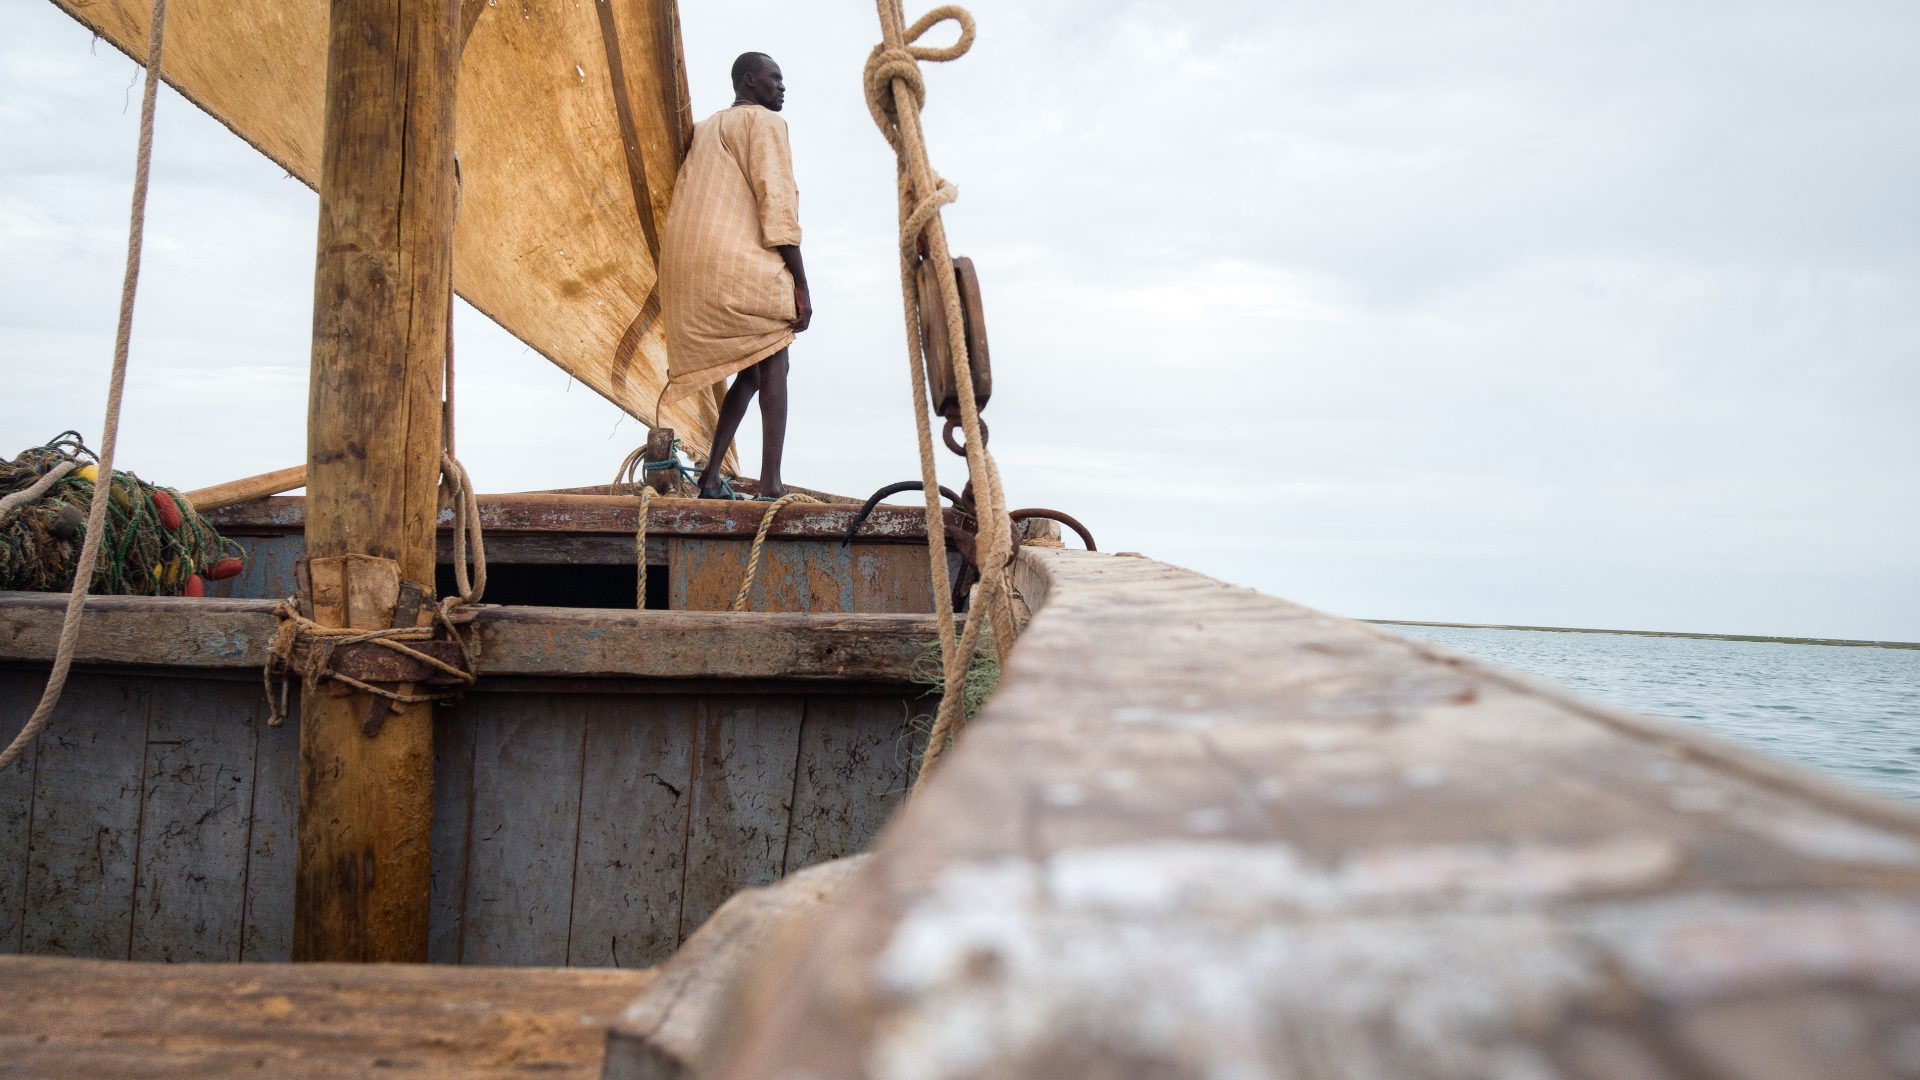 An Imraguen fisherman surveys the ocean looking for fish.